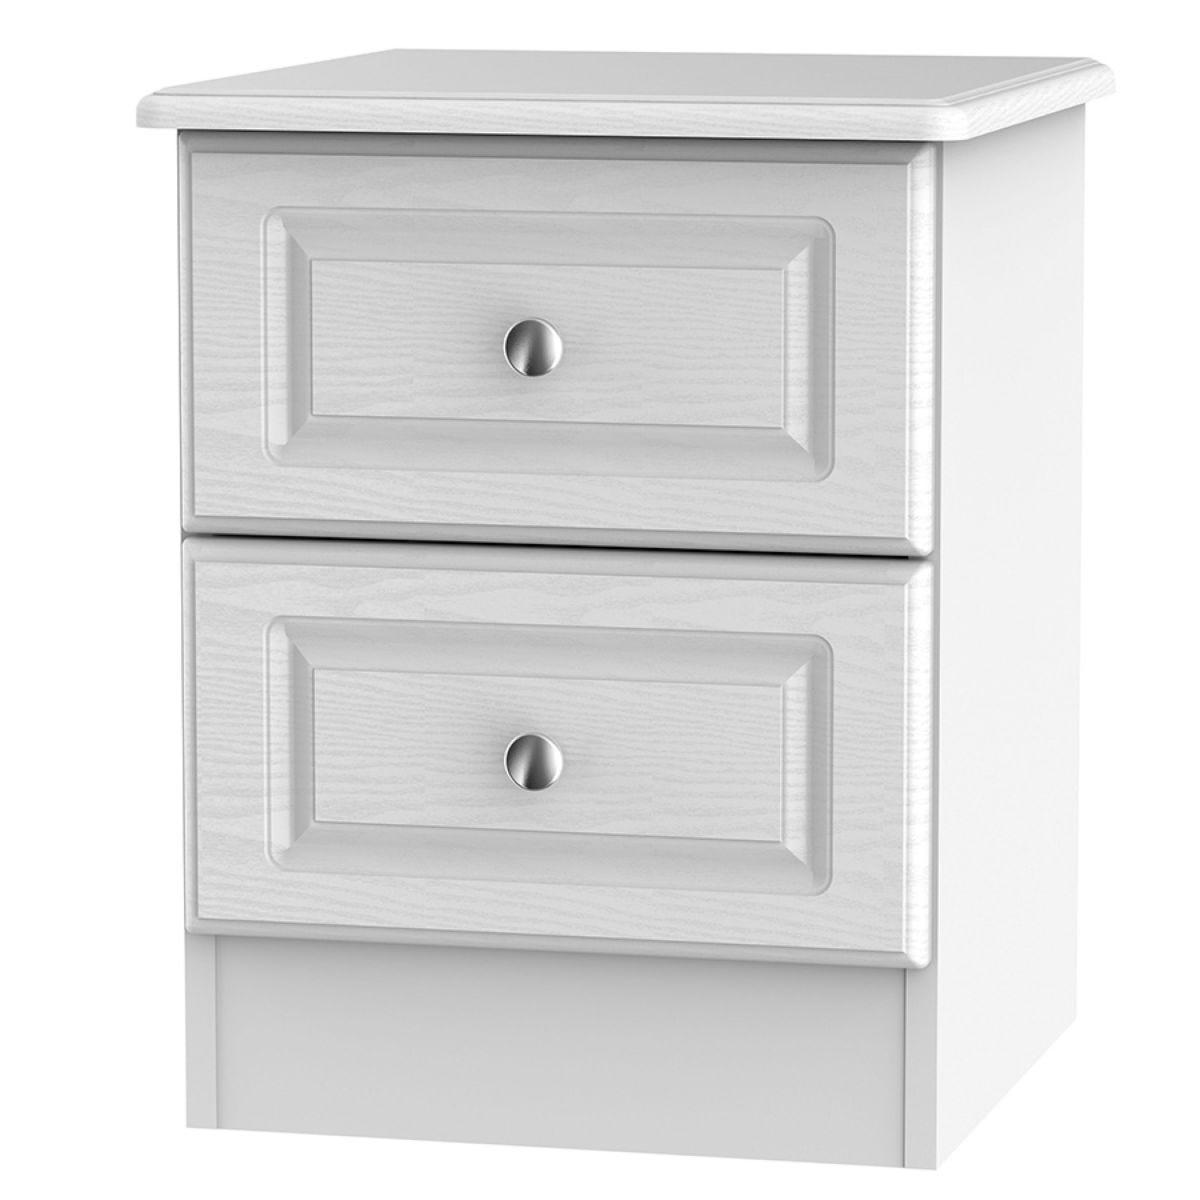 Montego 2-Drawer Bedside Table - White